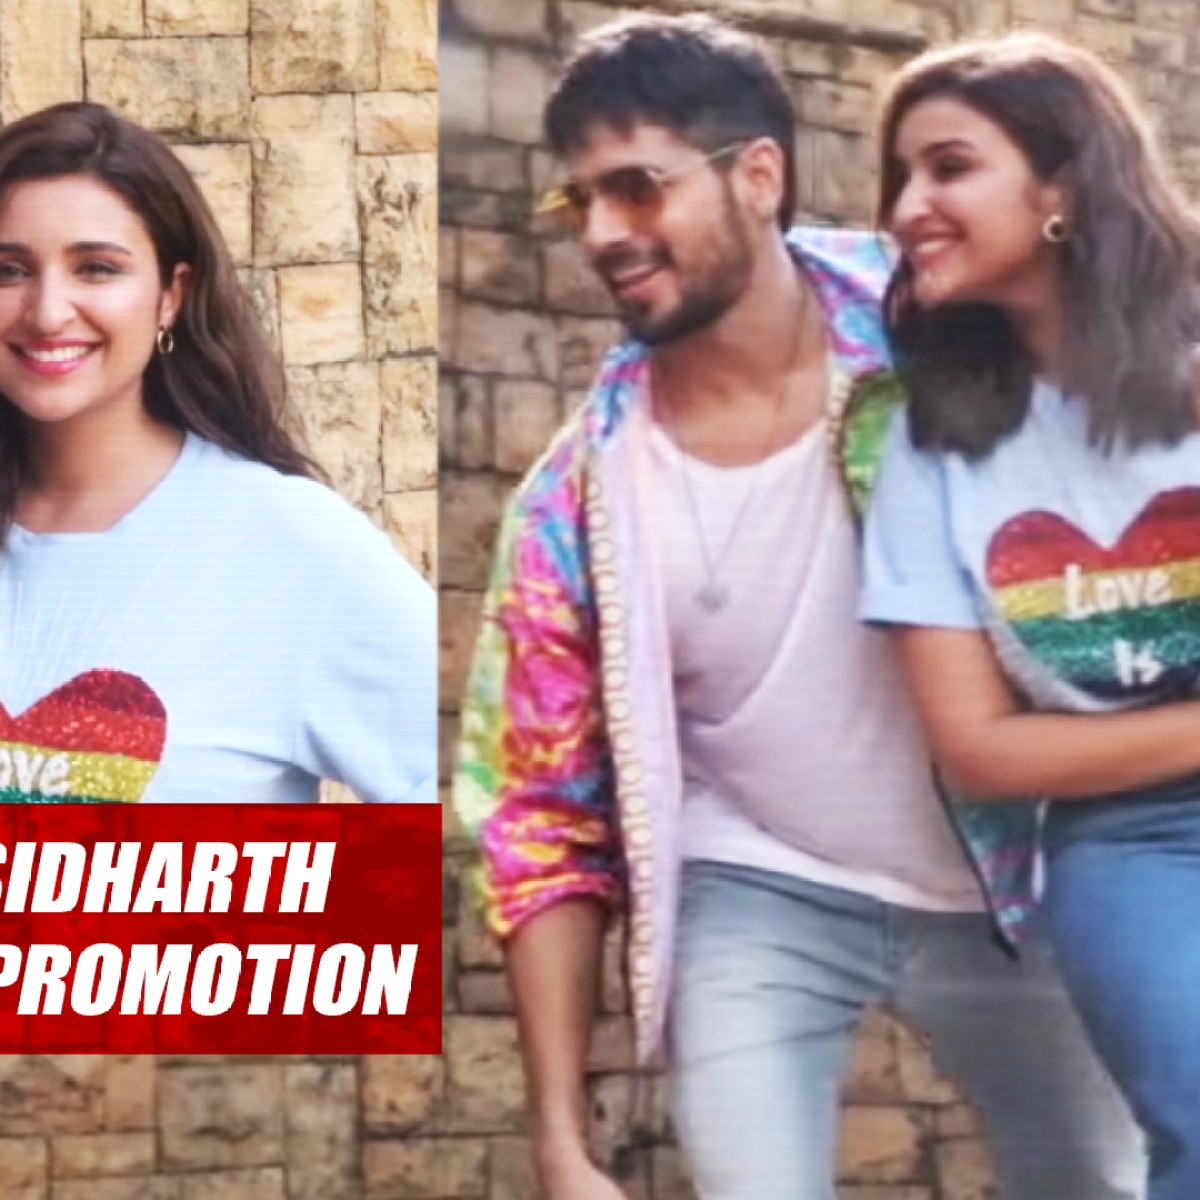 Parineeti Chopra, Sidharth Malhotra Are All Smiles During 'Jabariya Jodi' Promotion